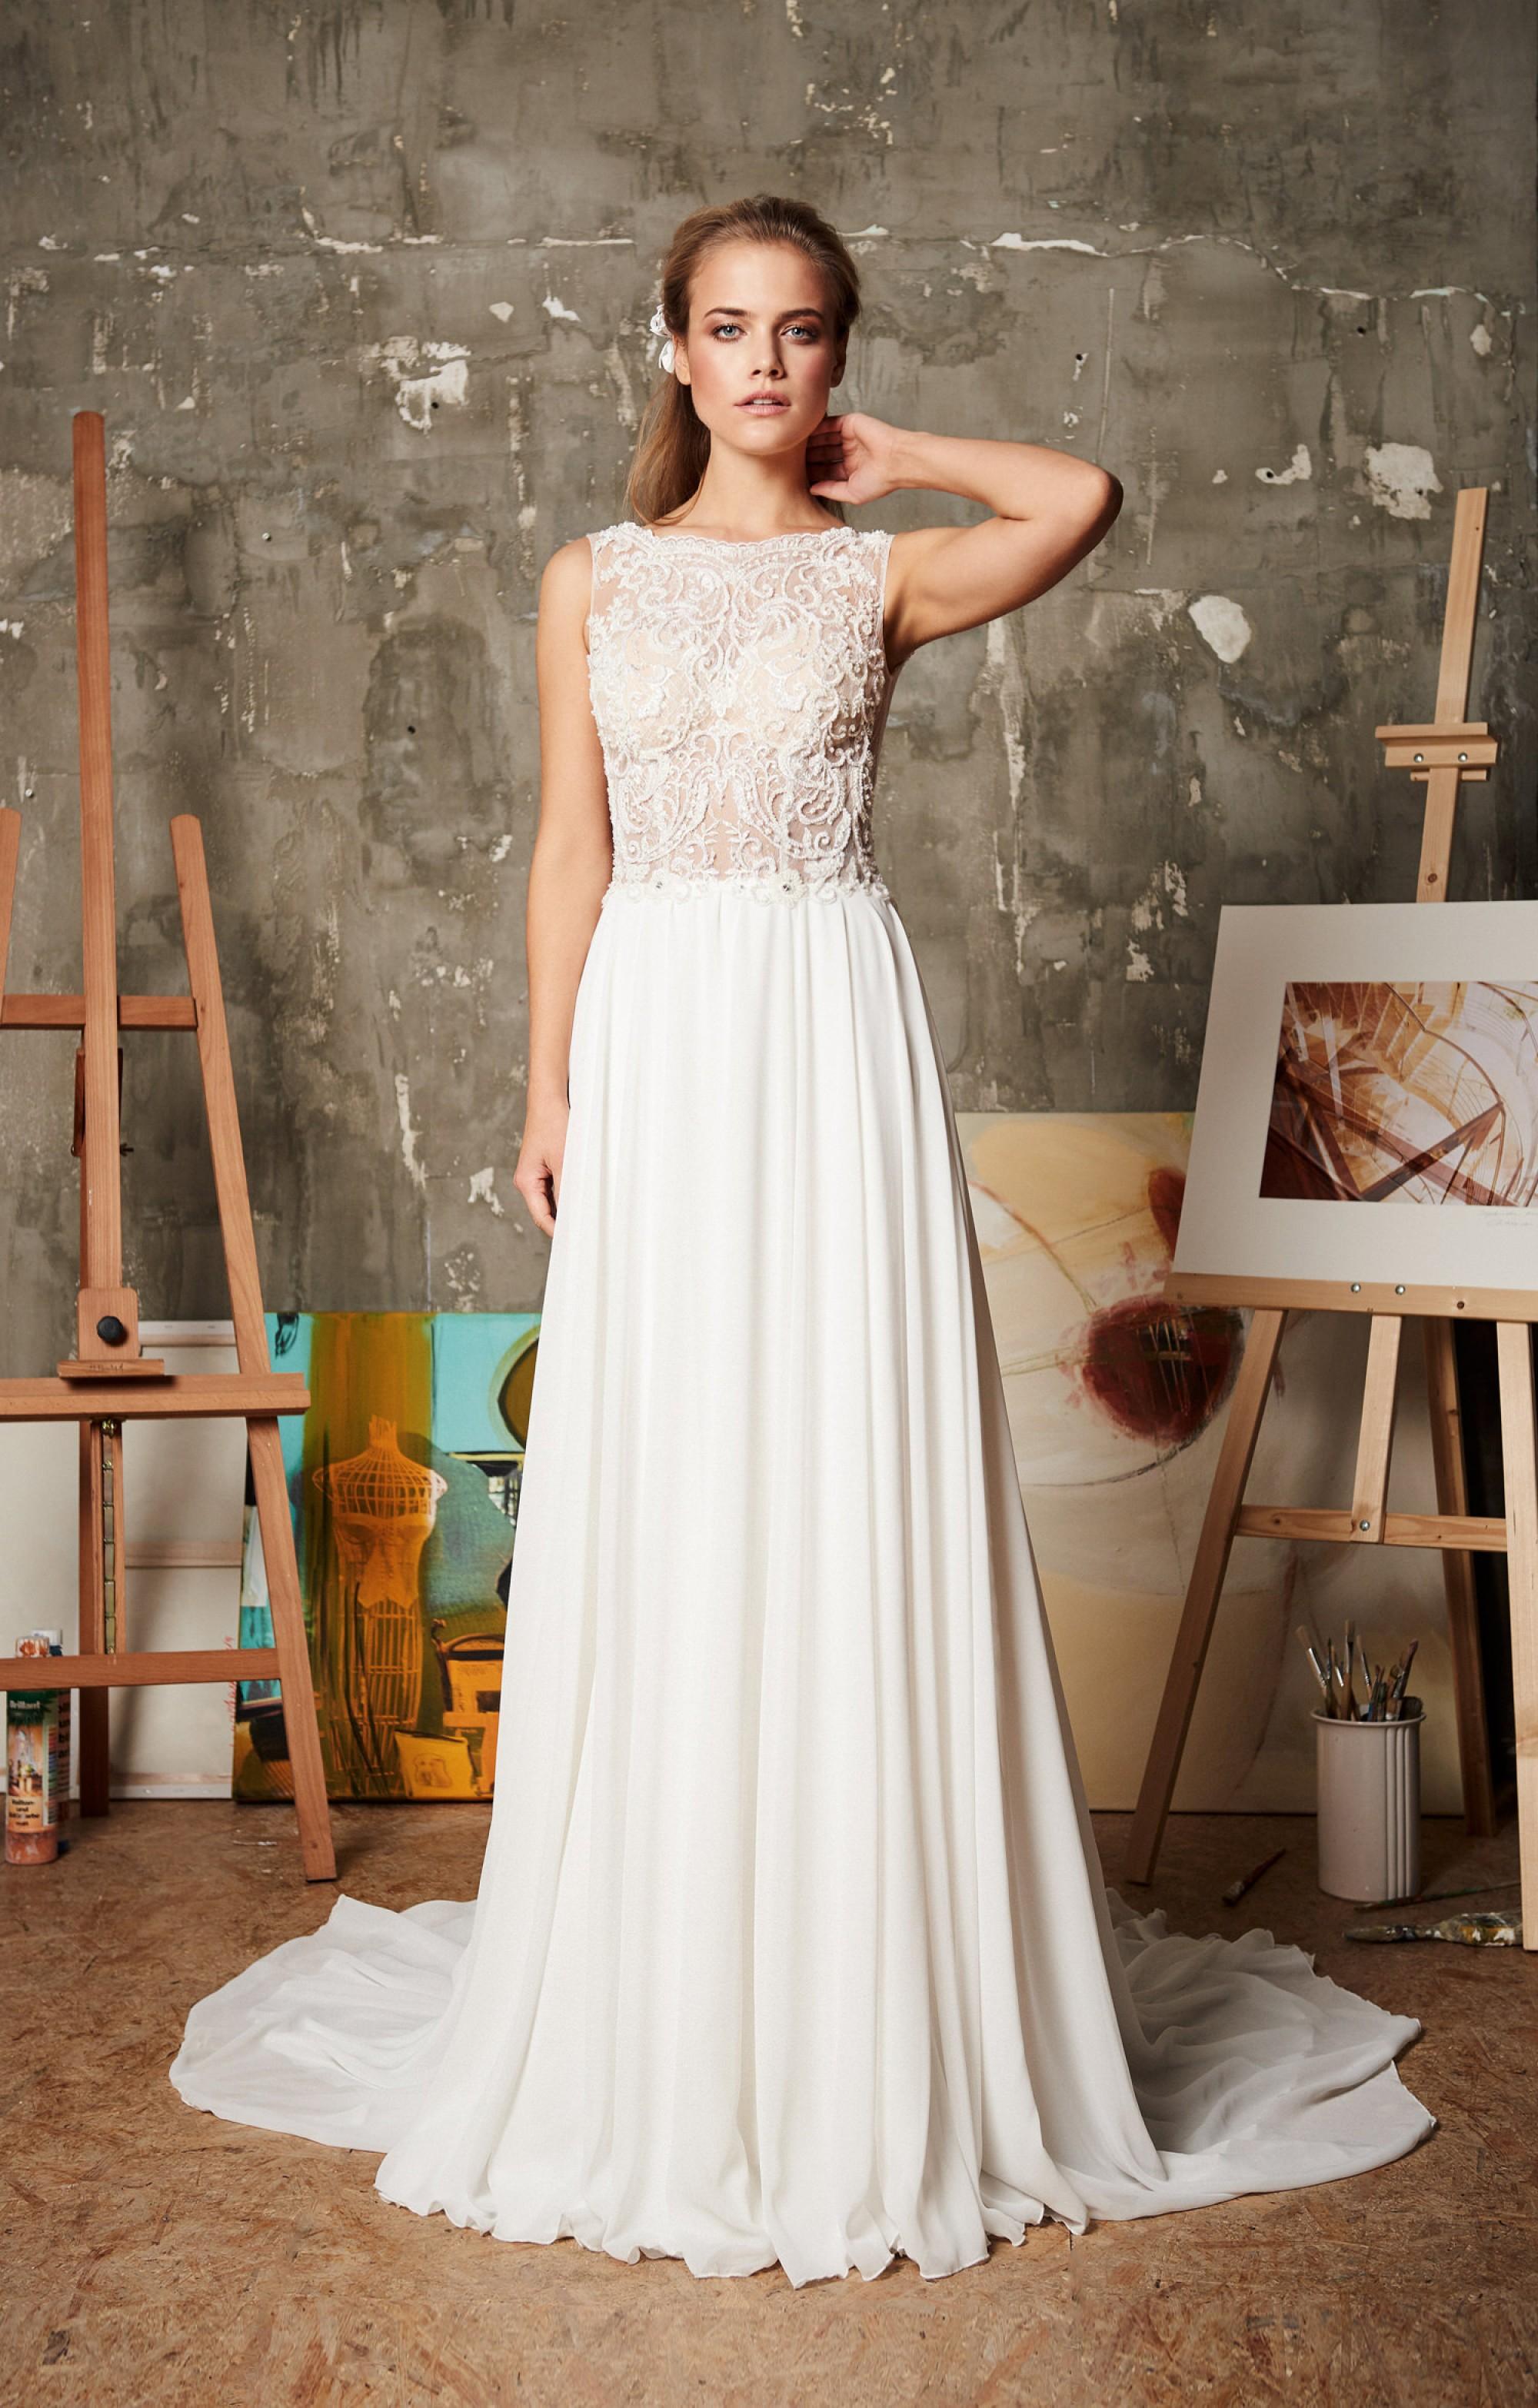 Brautkleider nach Maß